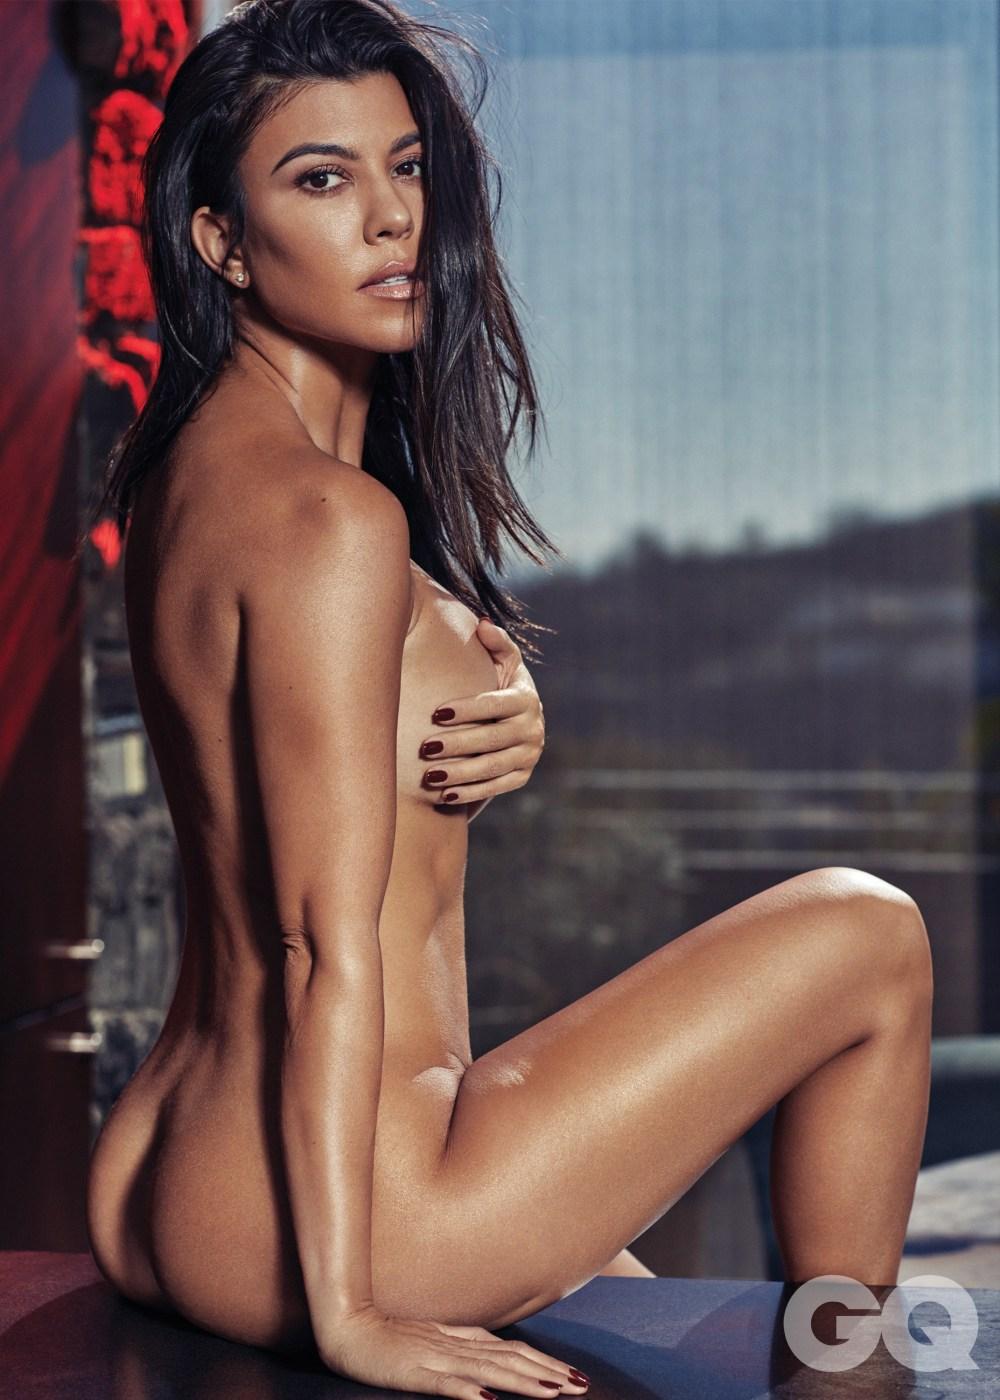 Kourtney Kardashian Shows Off Her Bare Booty in Sexy Photo